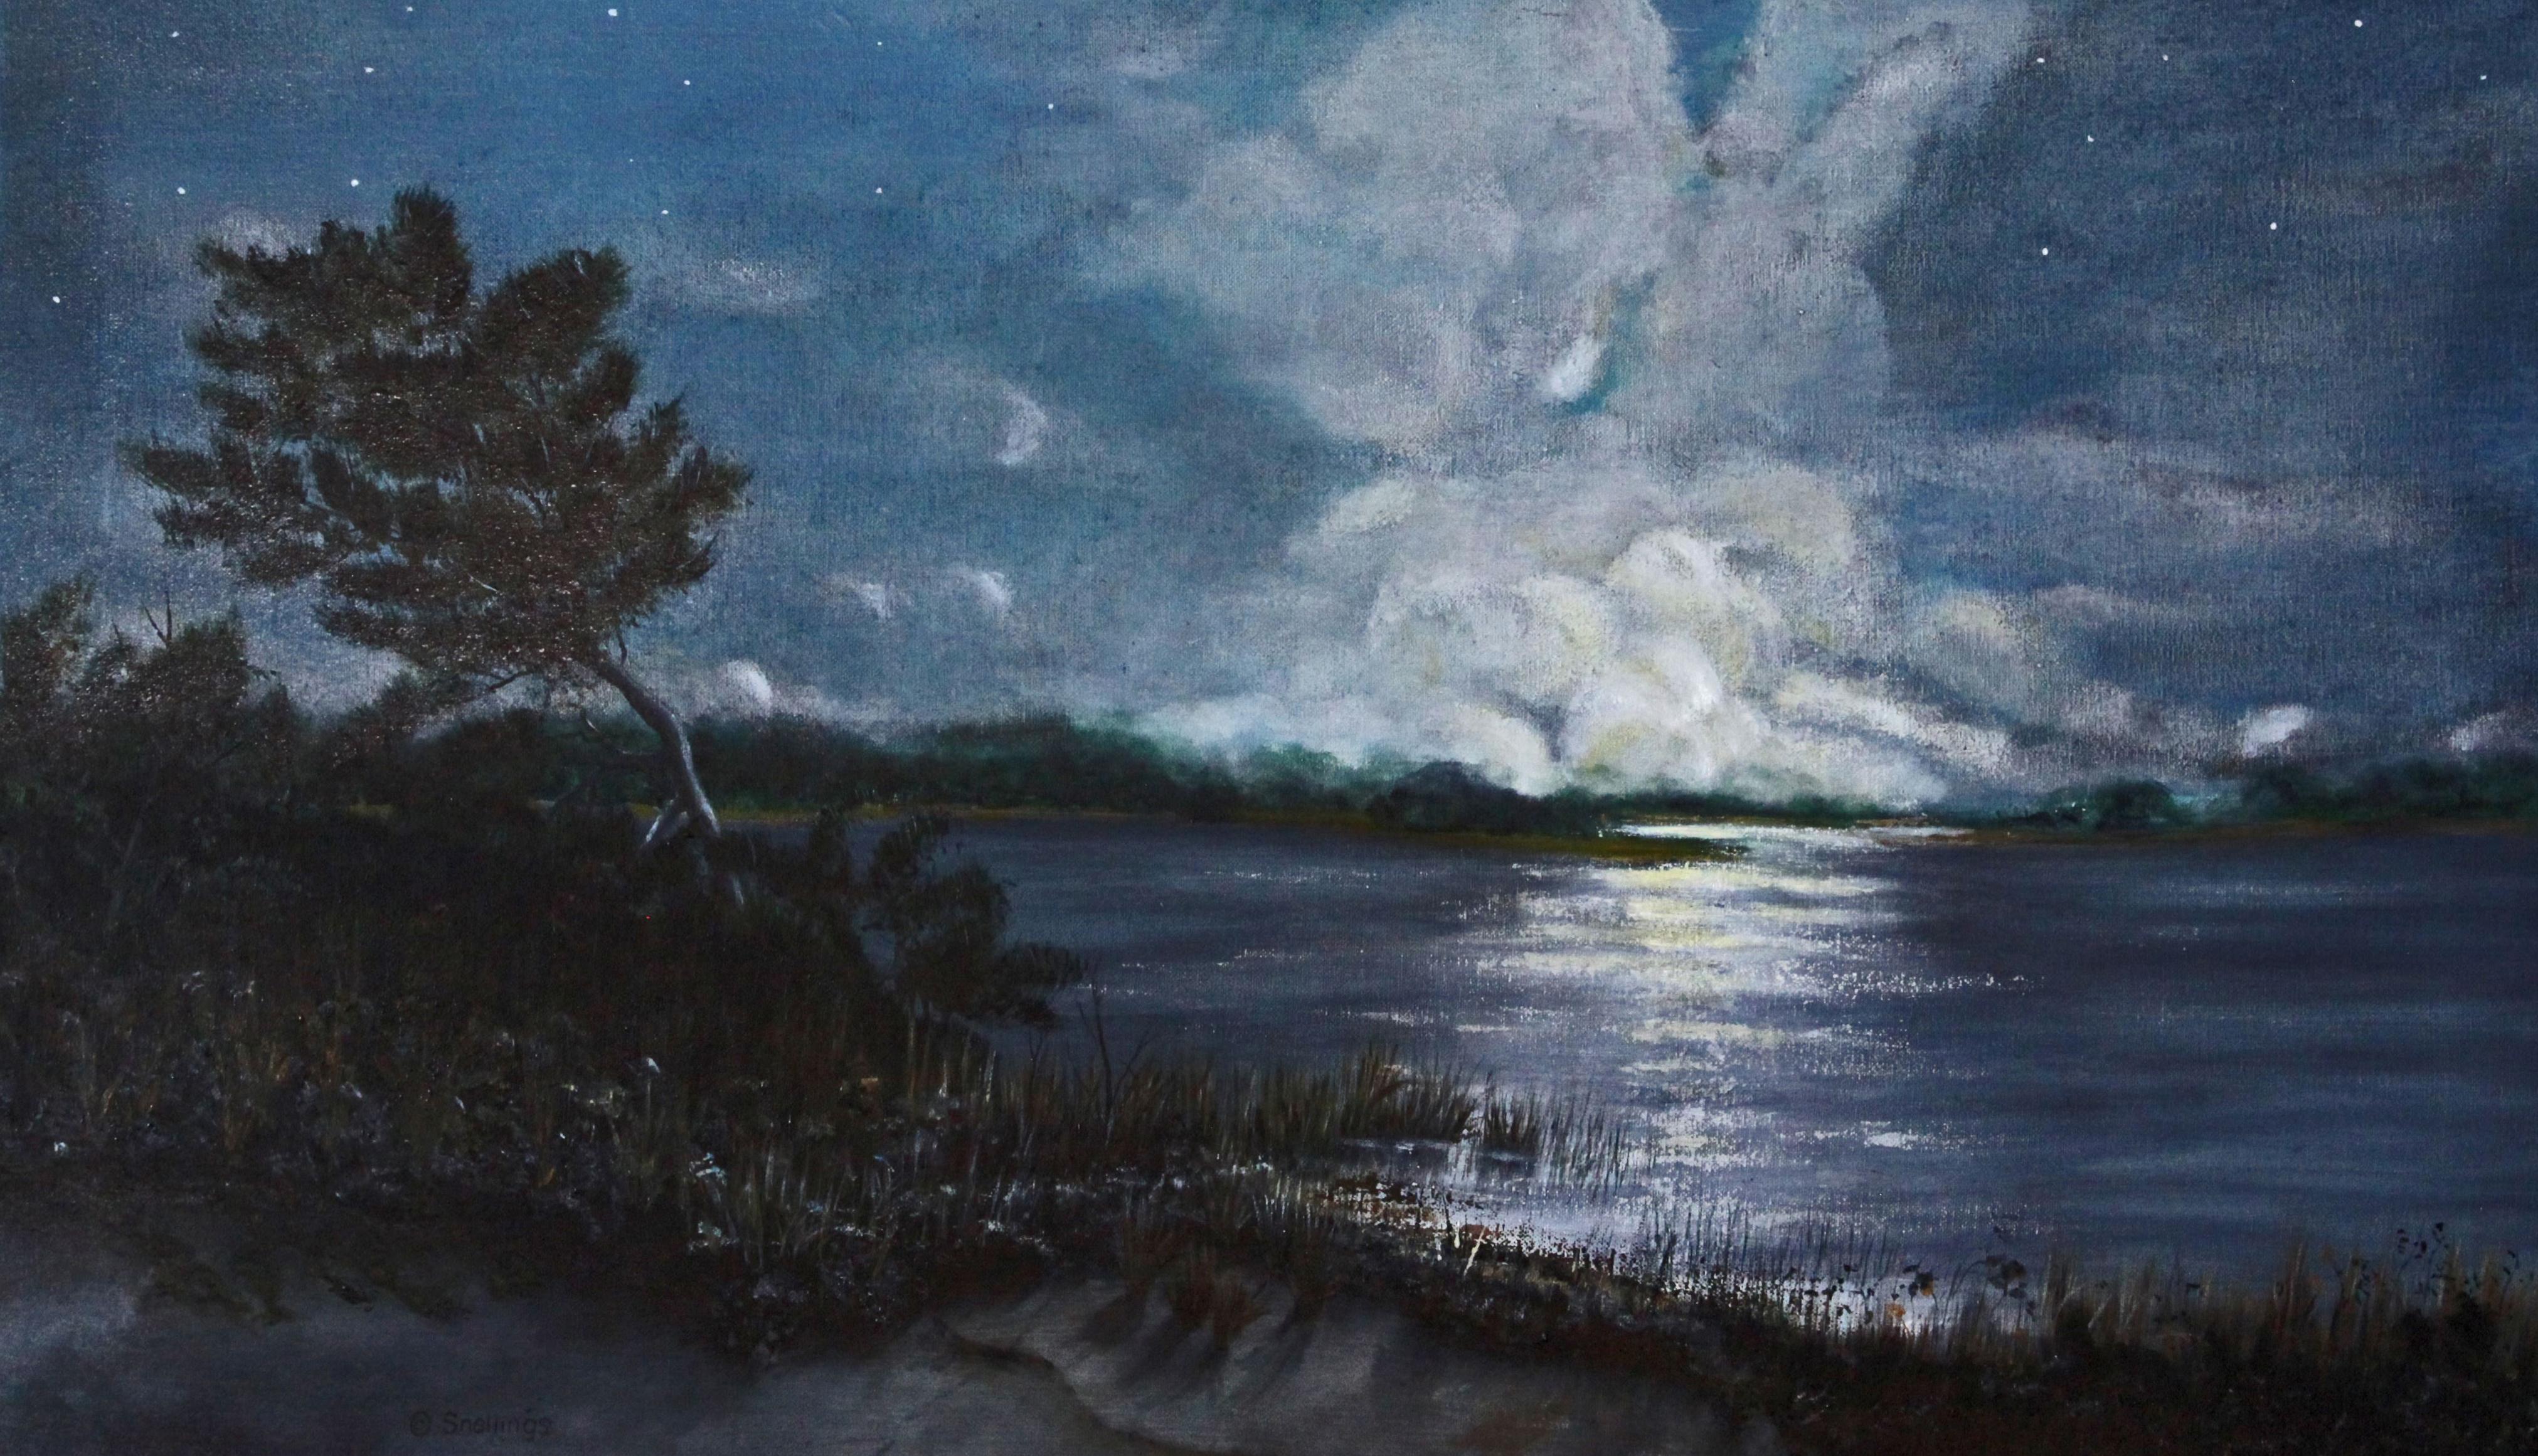 Moonrise on Middle Island